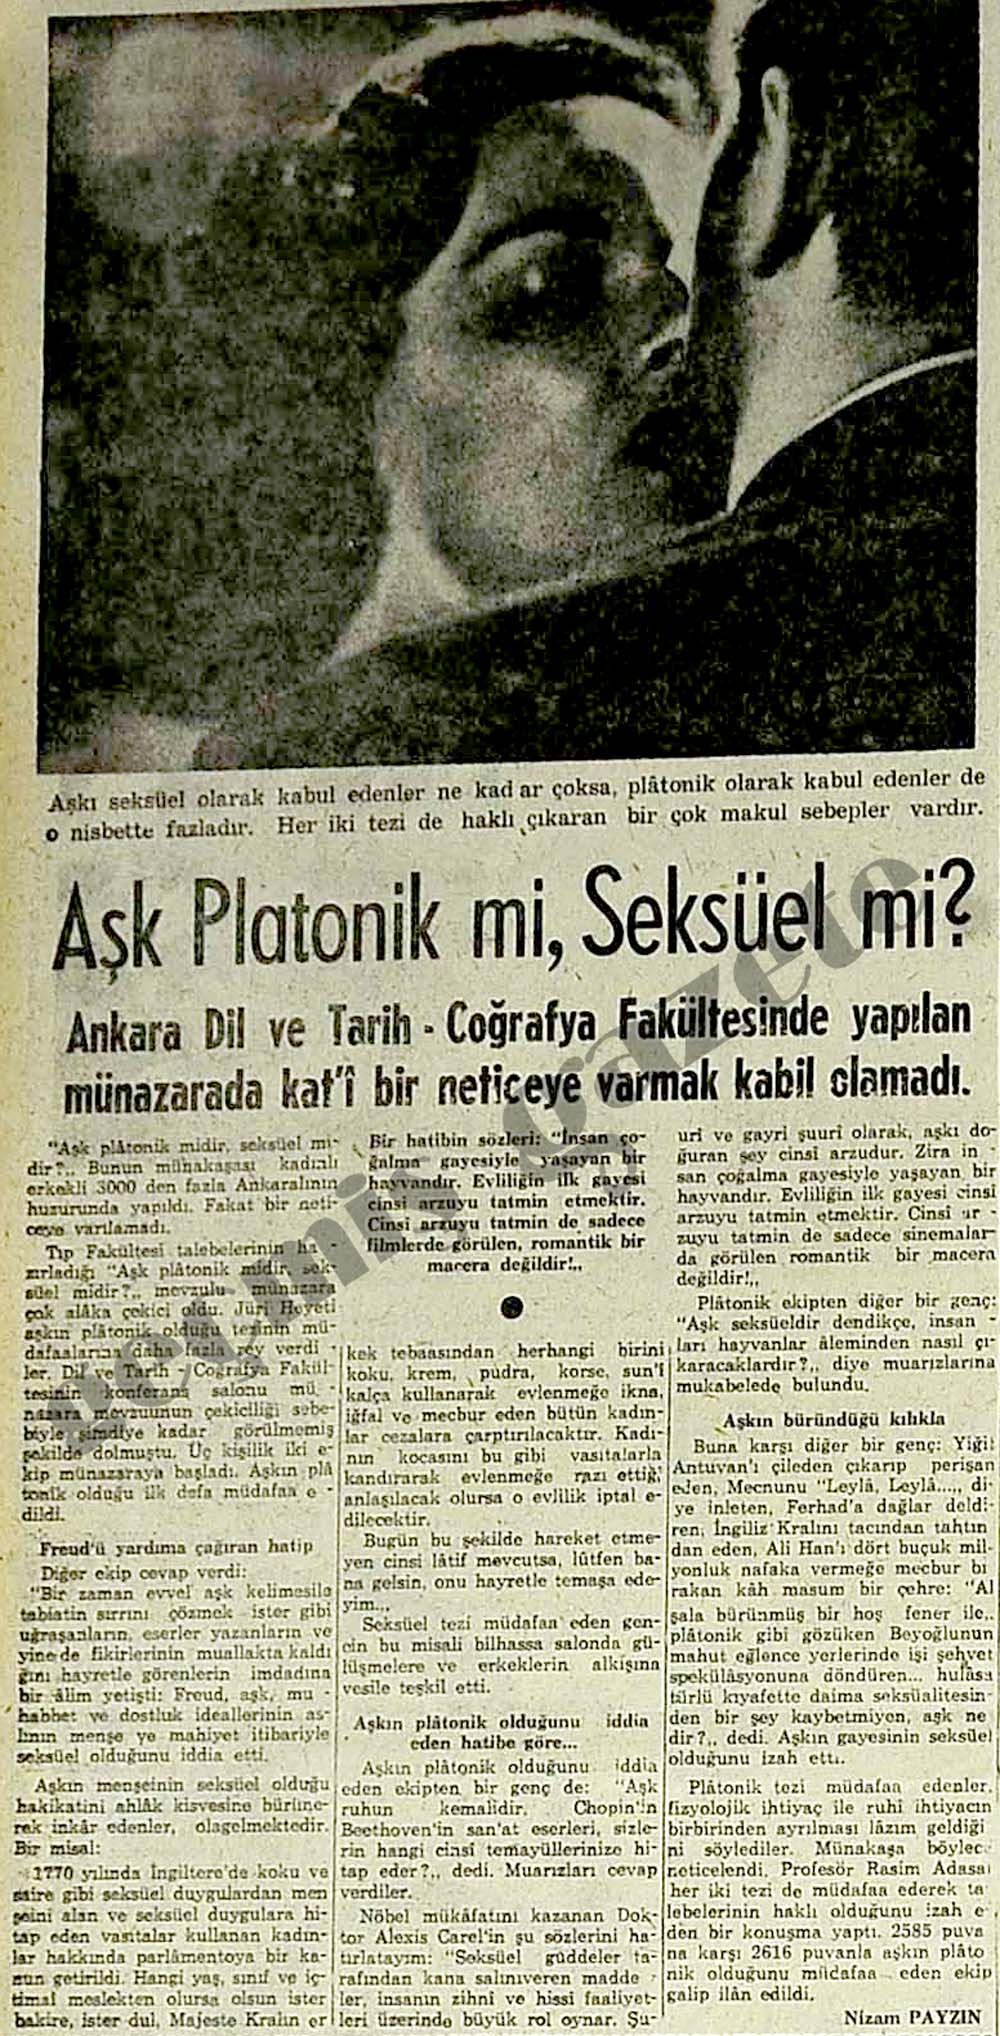 Aşk Platonik mi, Seksüel mi?